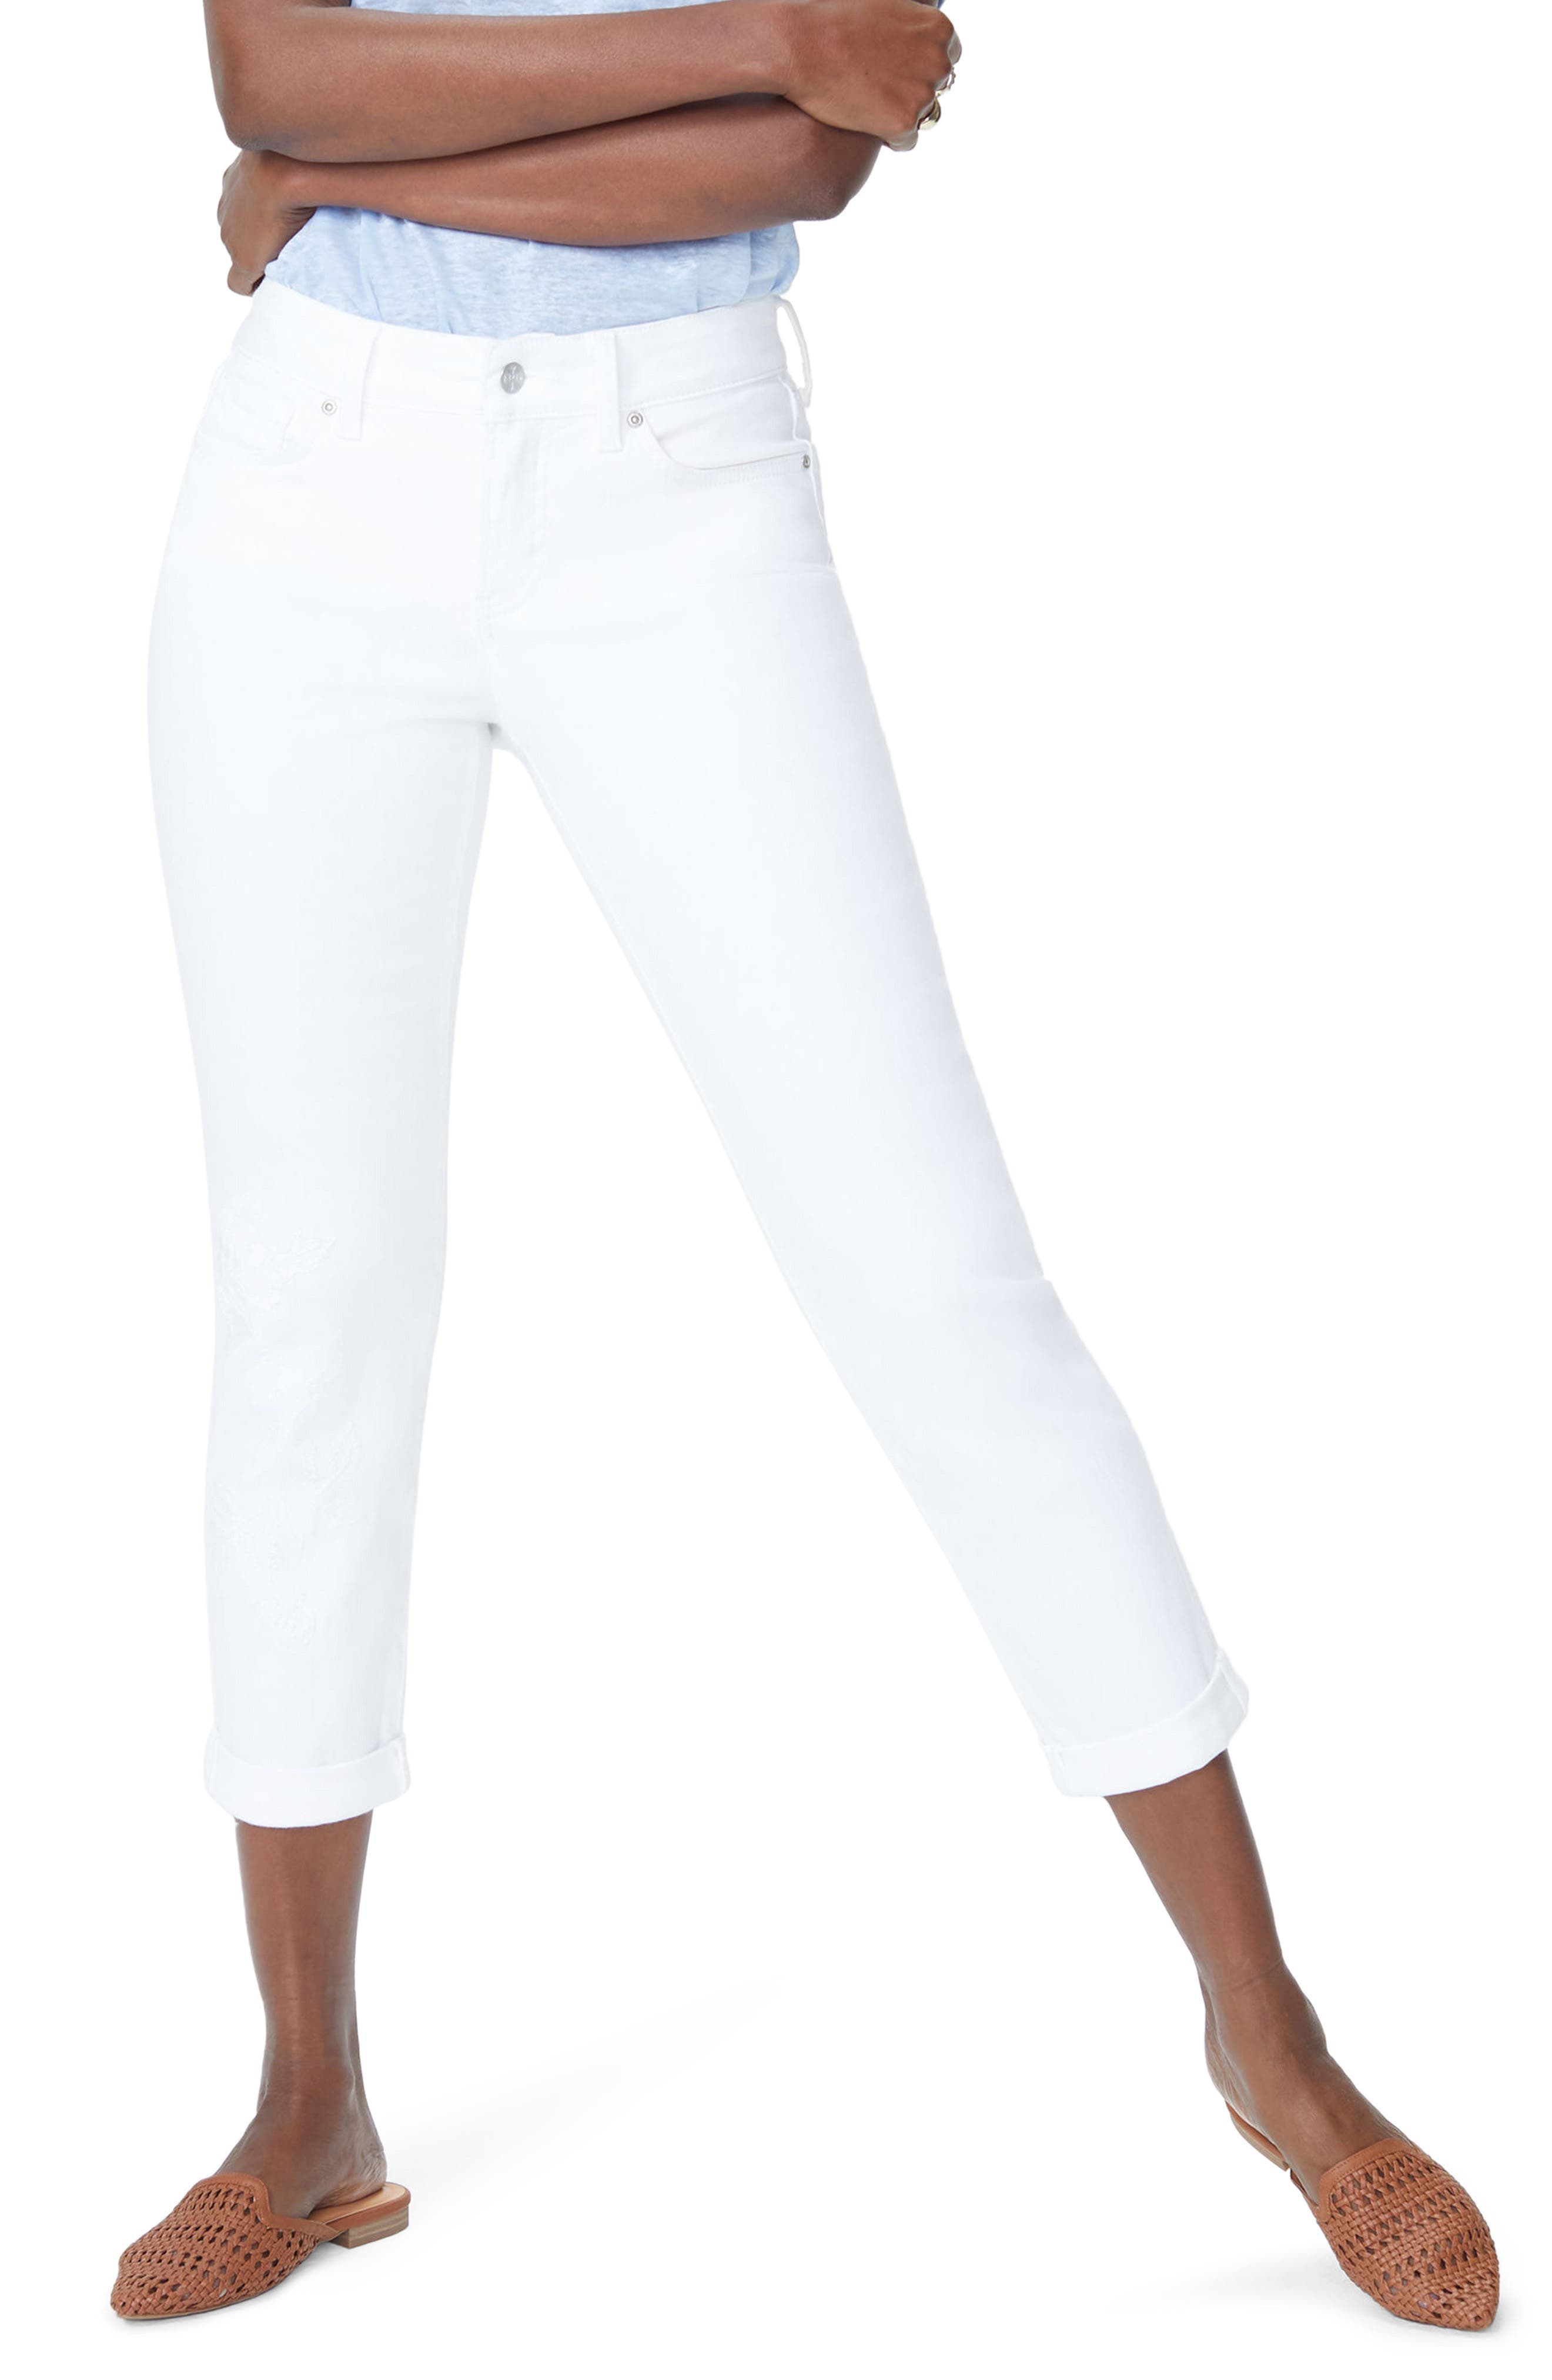 Puff Embroidery White Boyfriend Jeans,                             Main thumbnail 1, color,                             Optic White